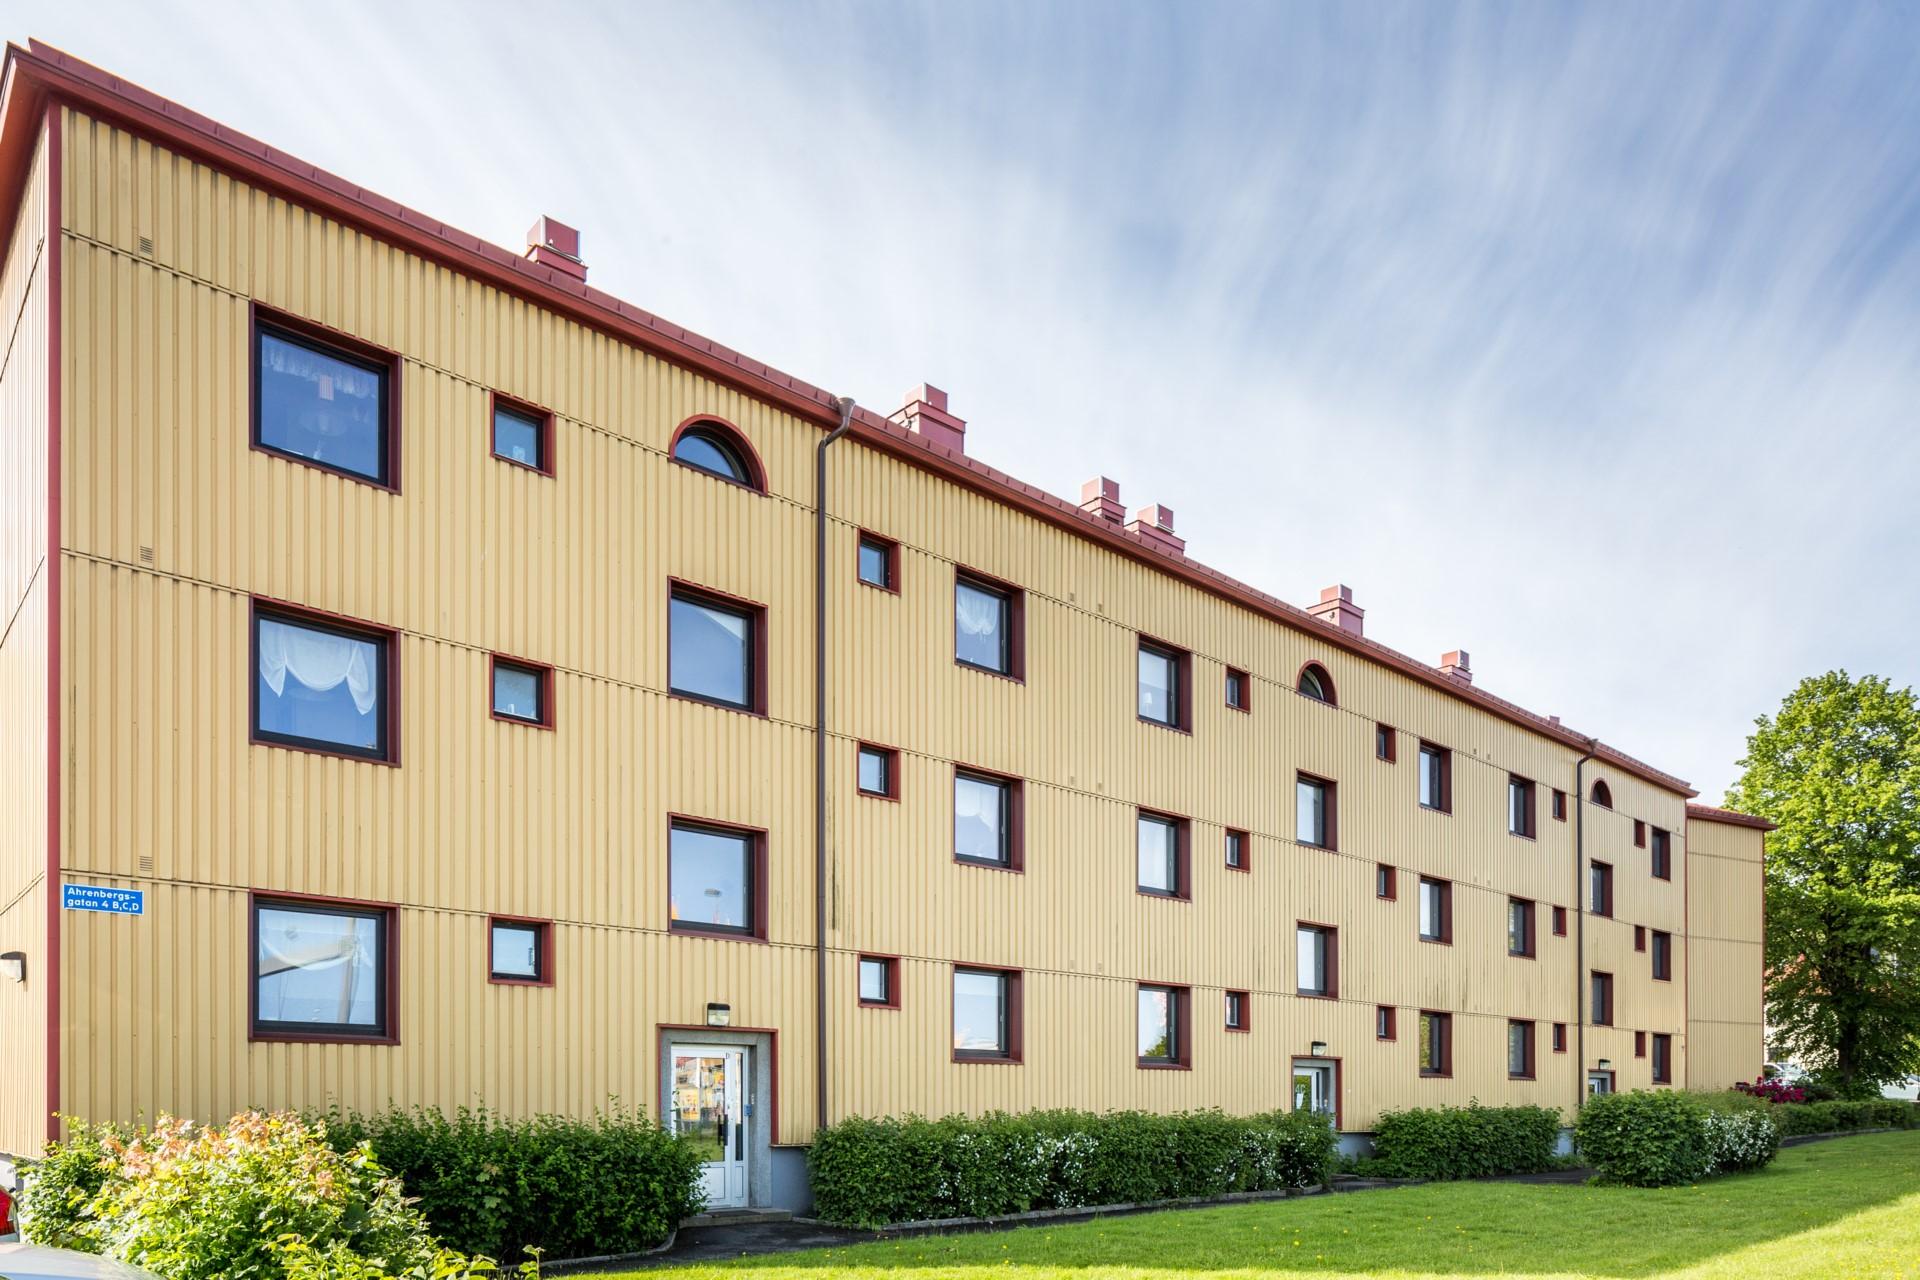 Ahrenbergsgatan 4C-3